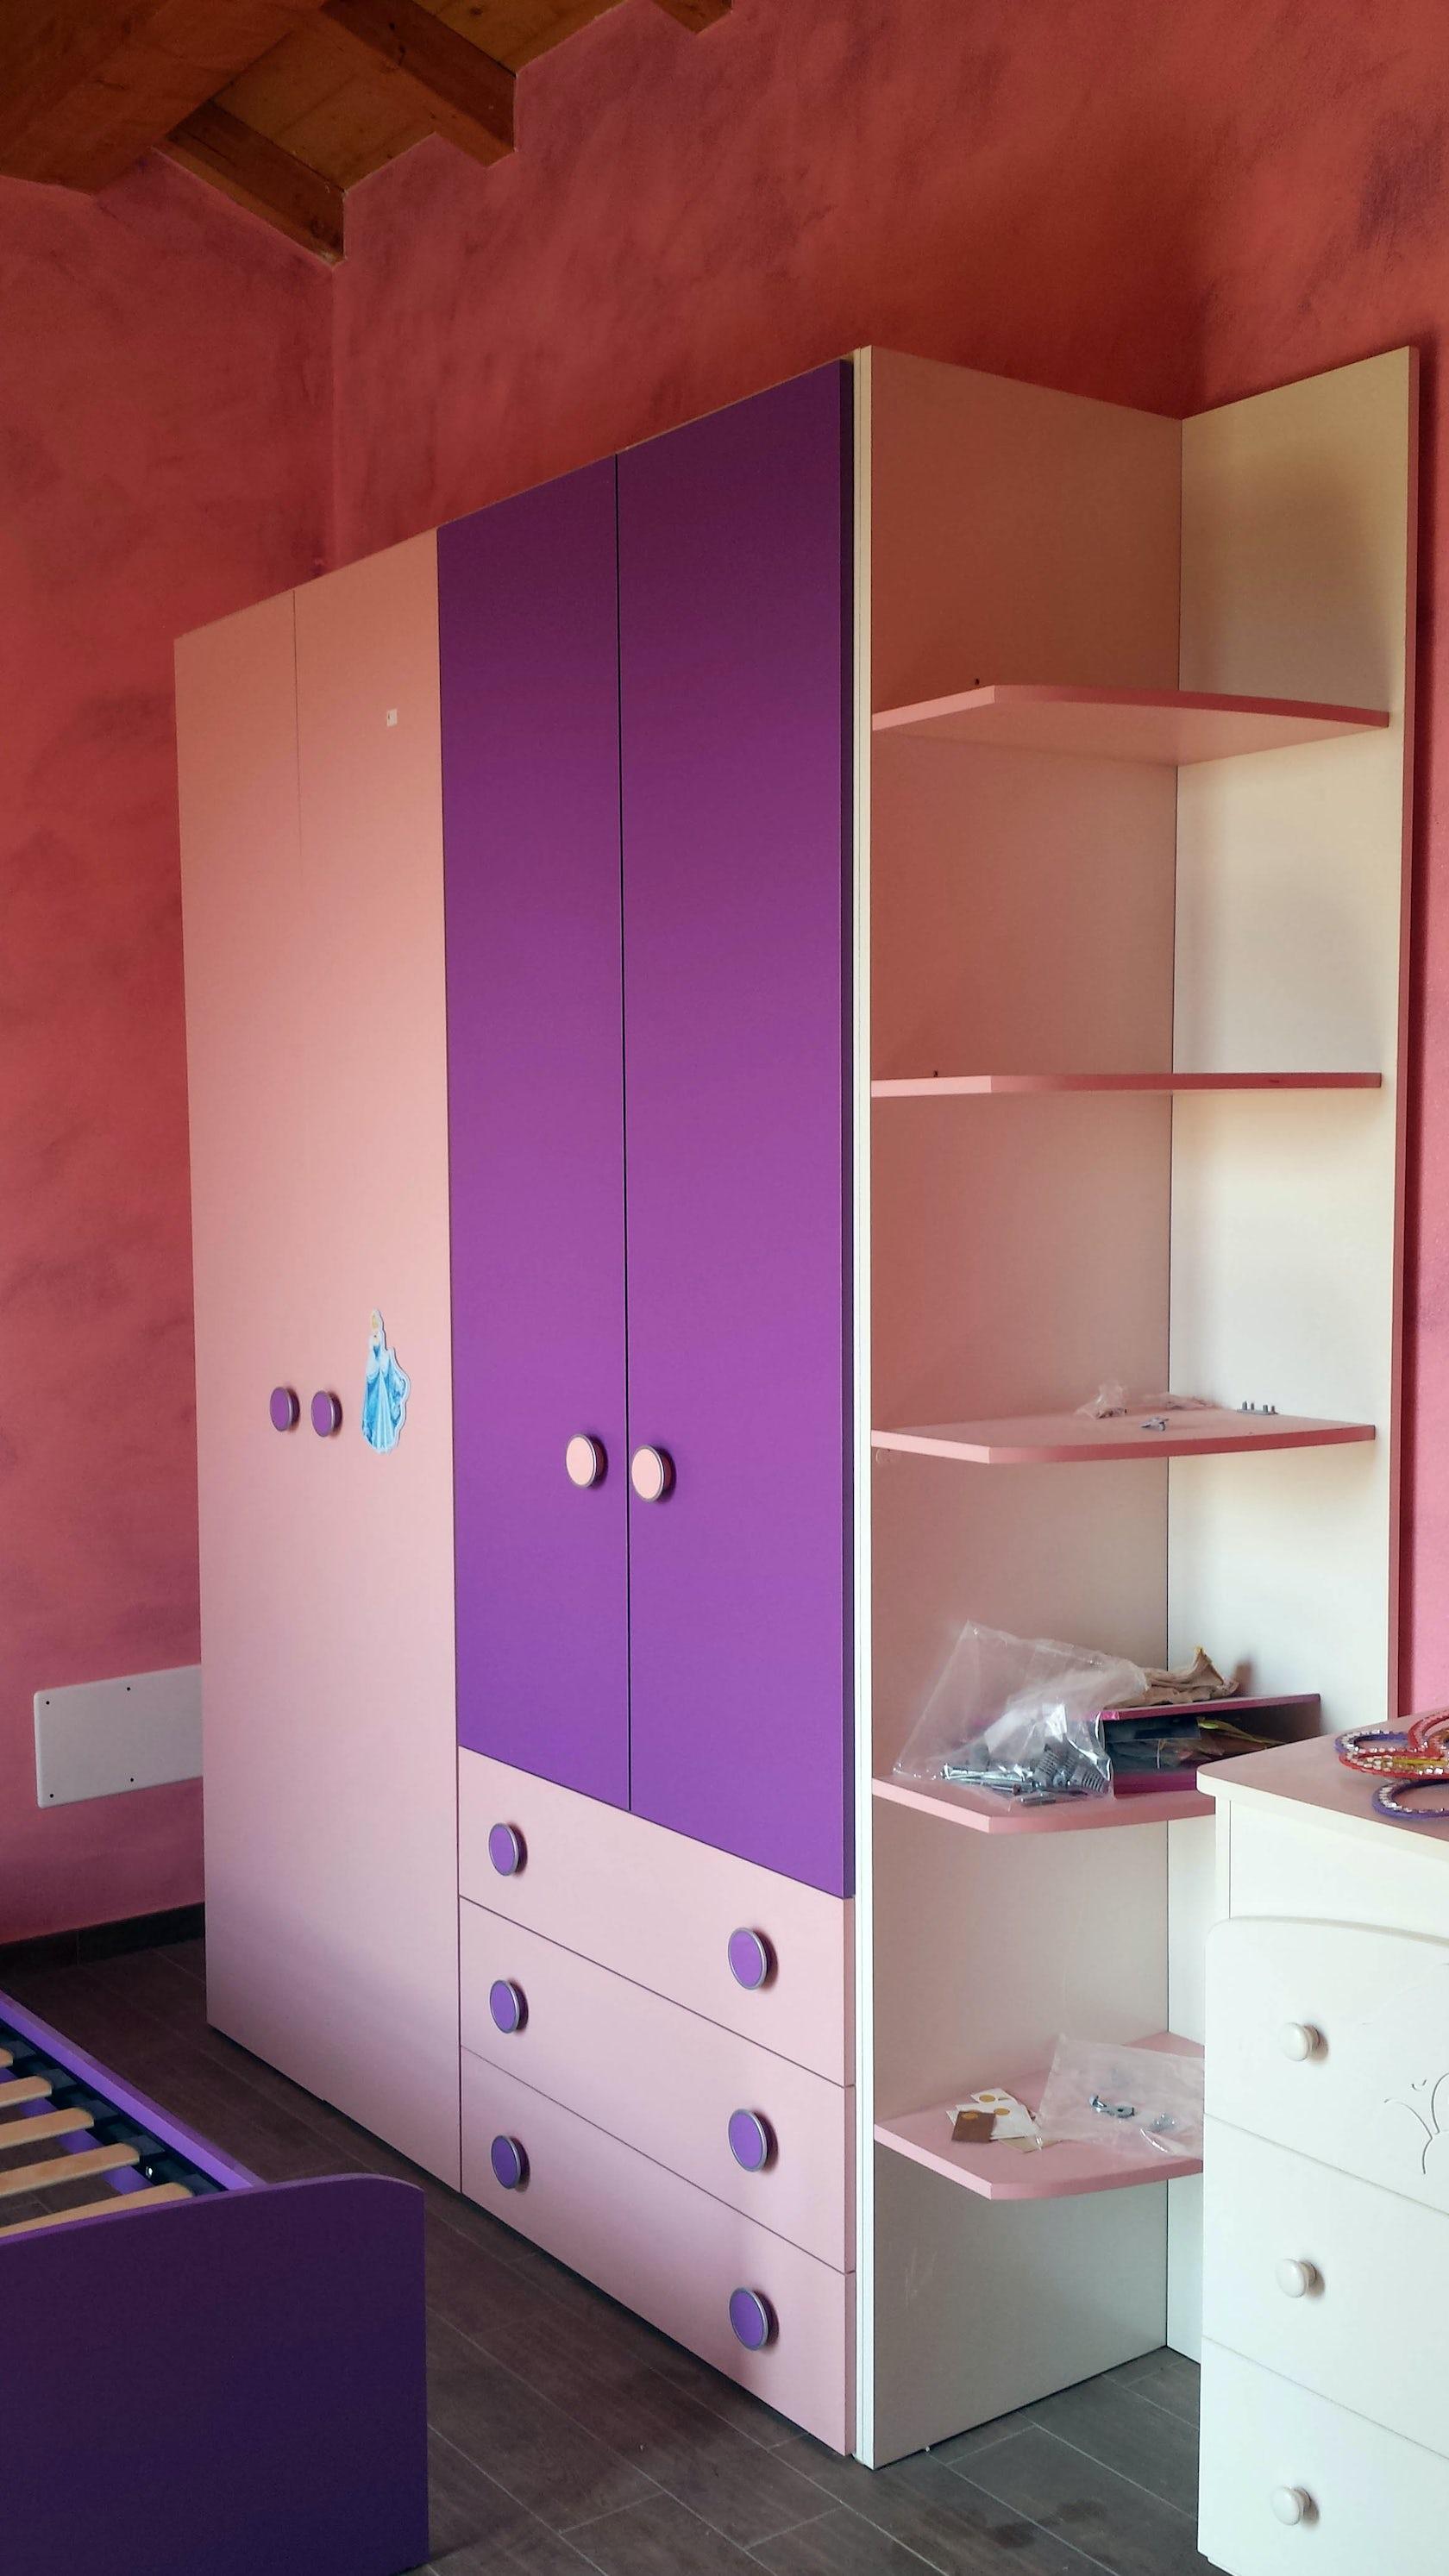 Cameretta in mansarda viola e rosa architizer - Cameretta in mansarda ...